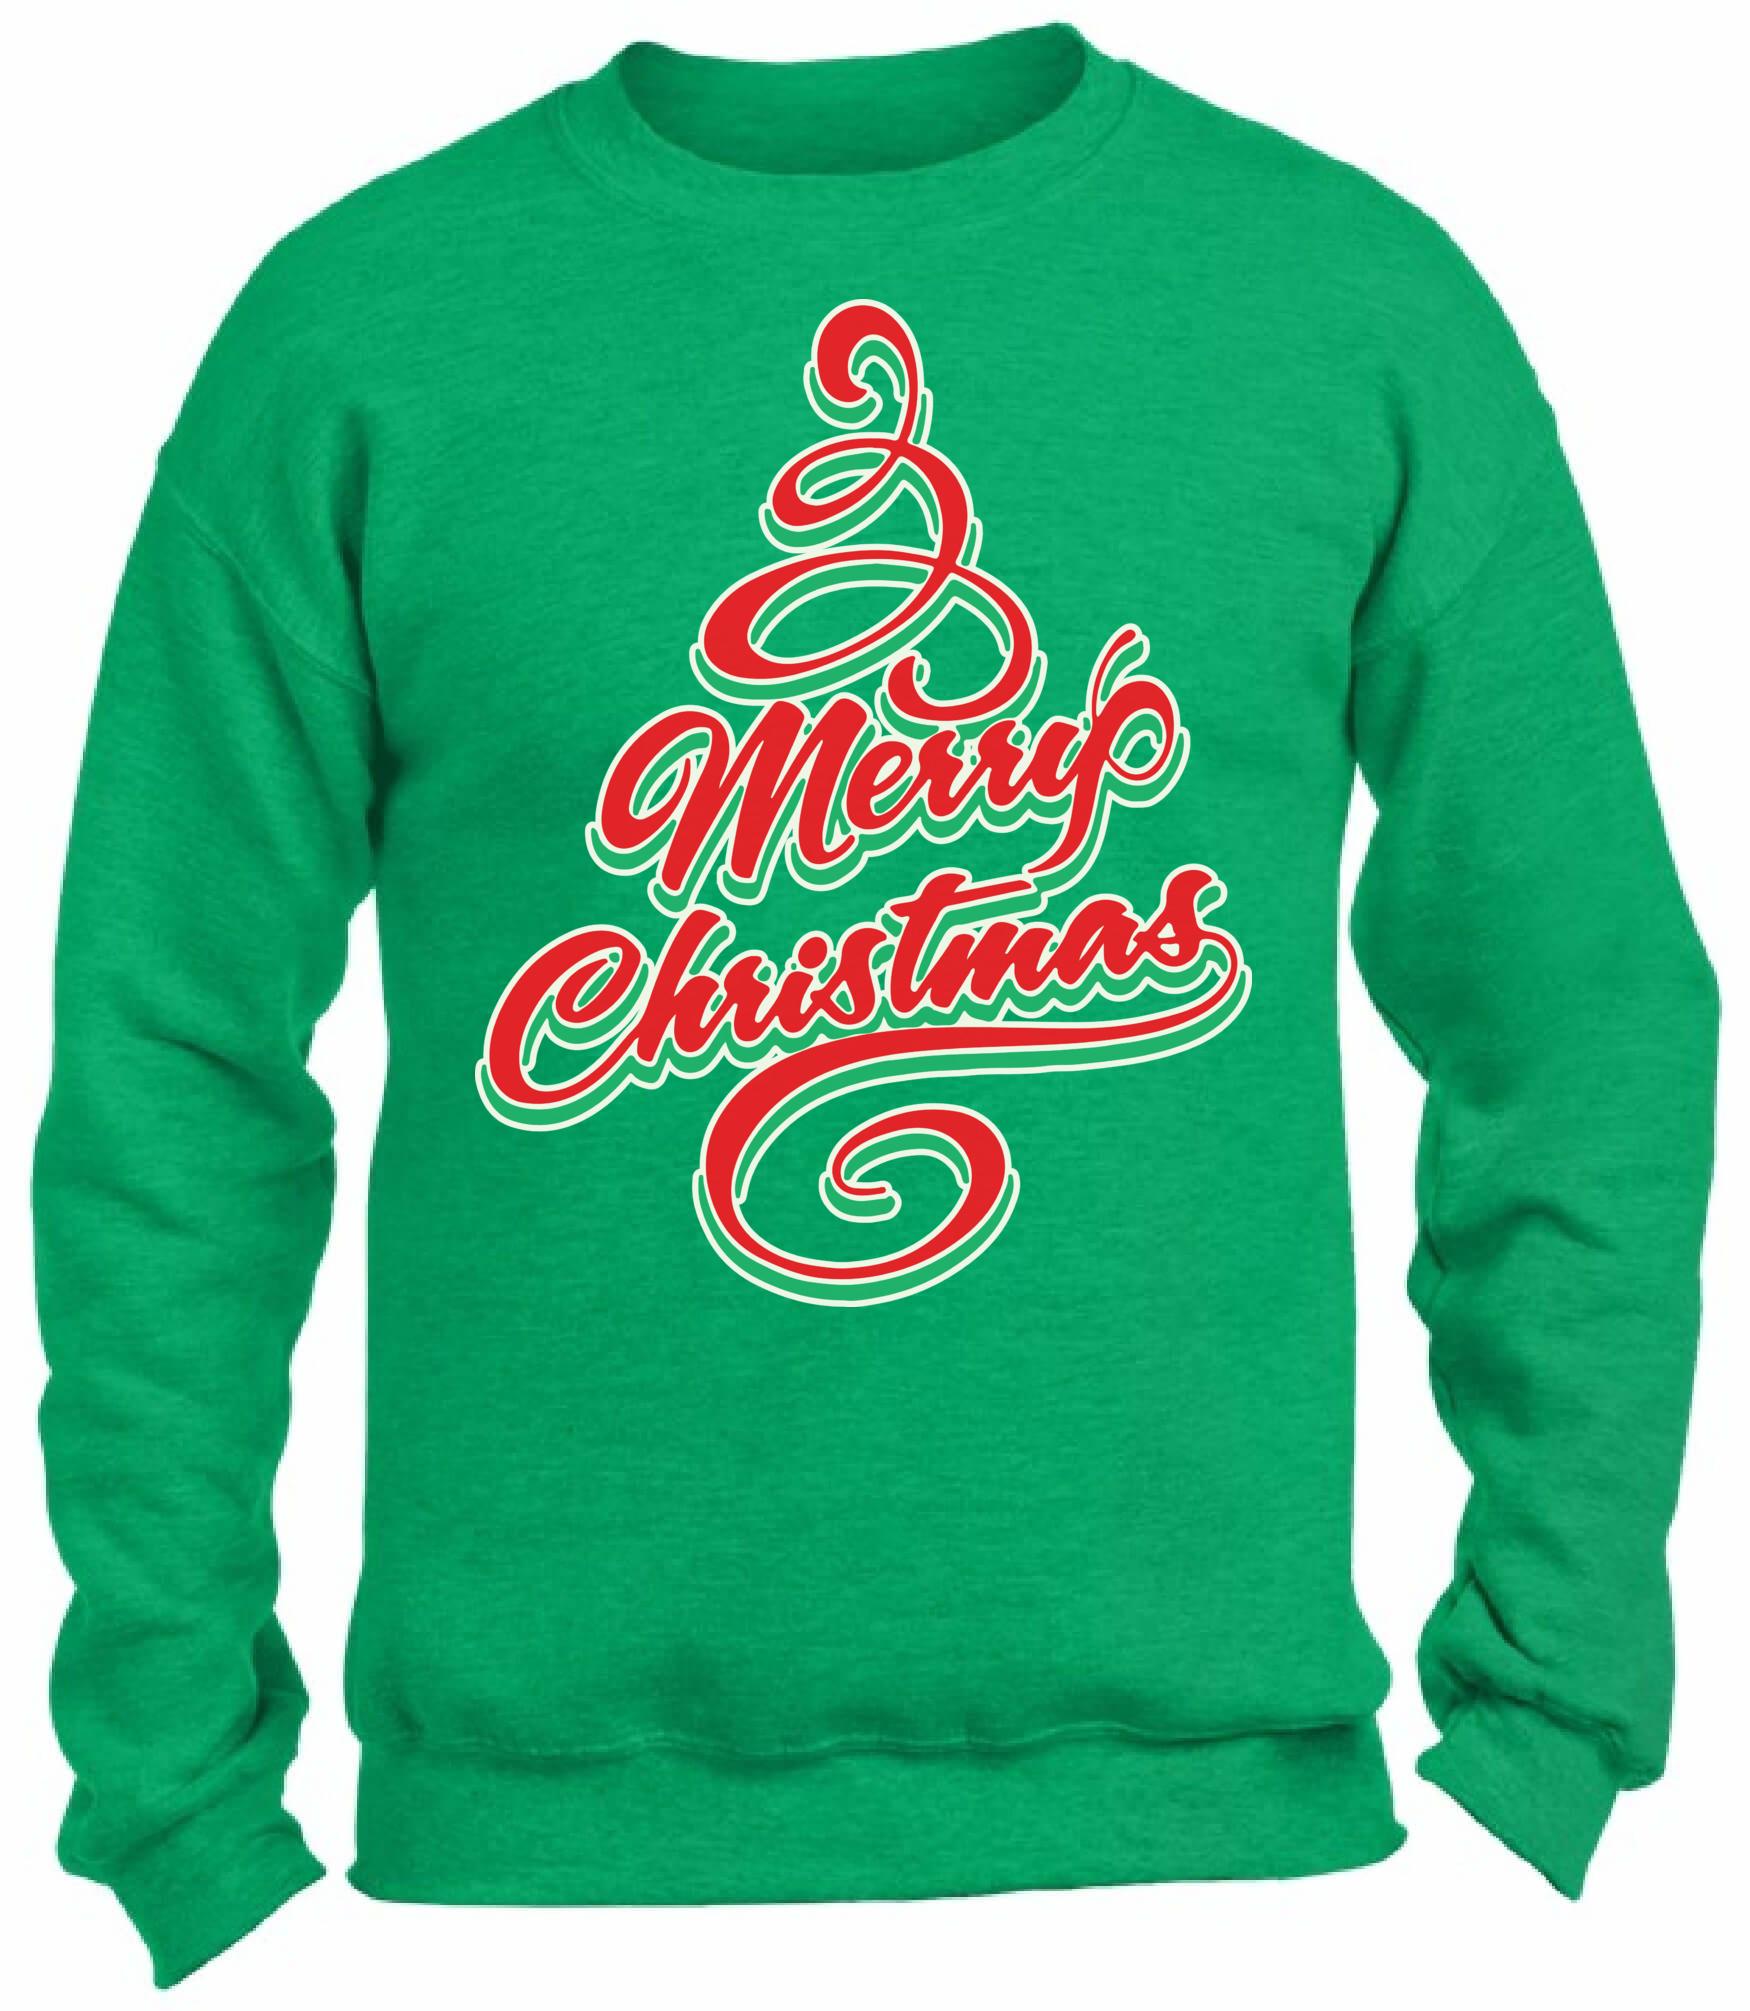 Merry Christmas Tree Christmas Sweatshirt Ugly Christmas Sweater ...